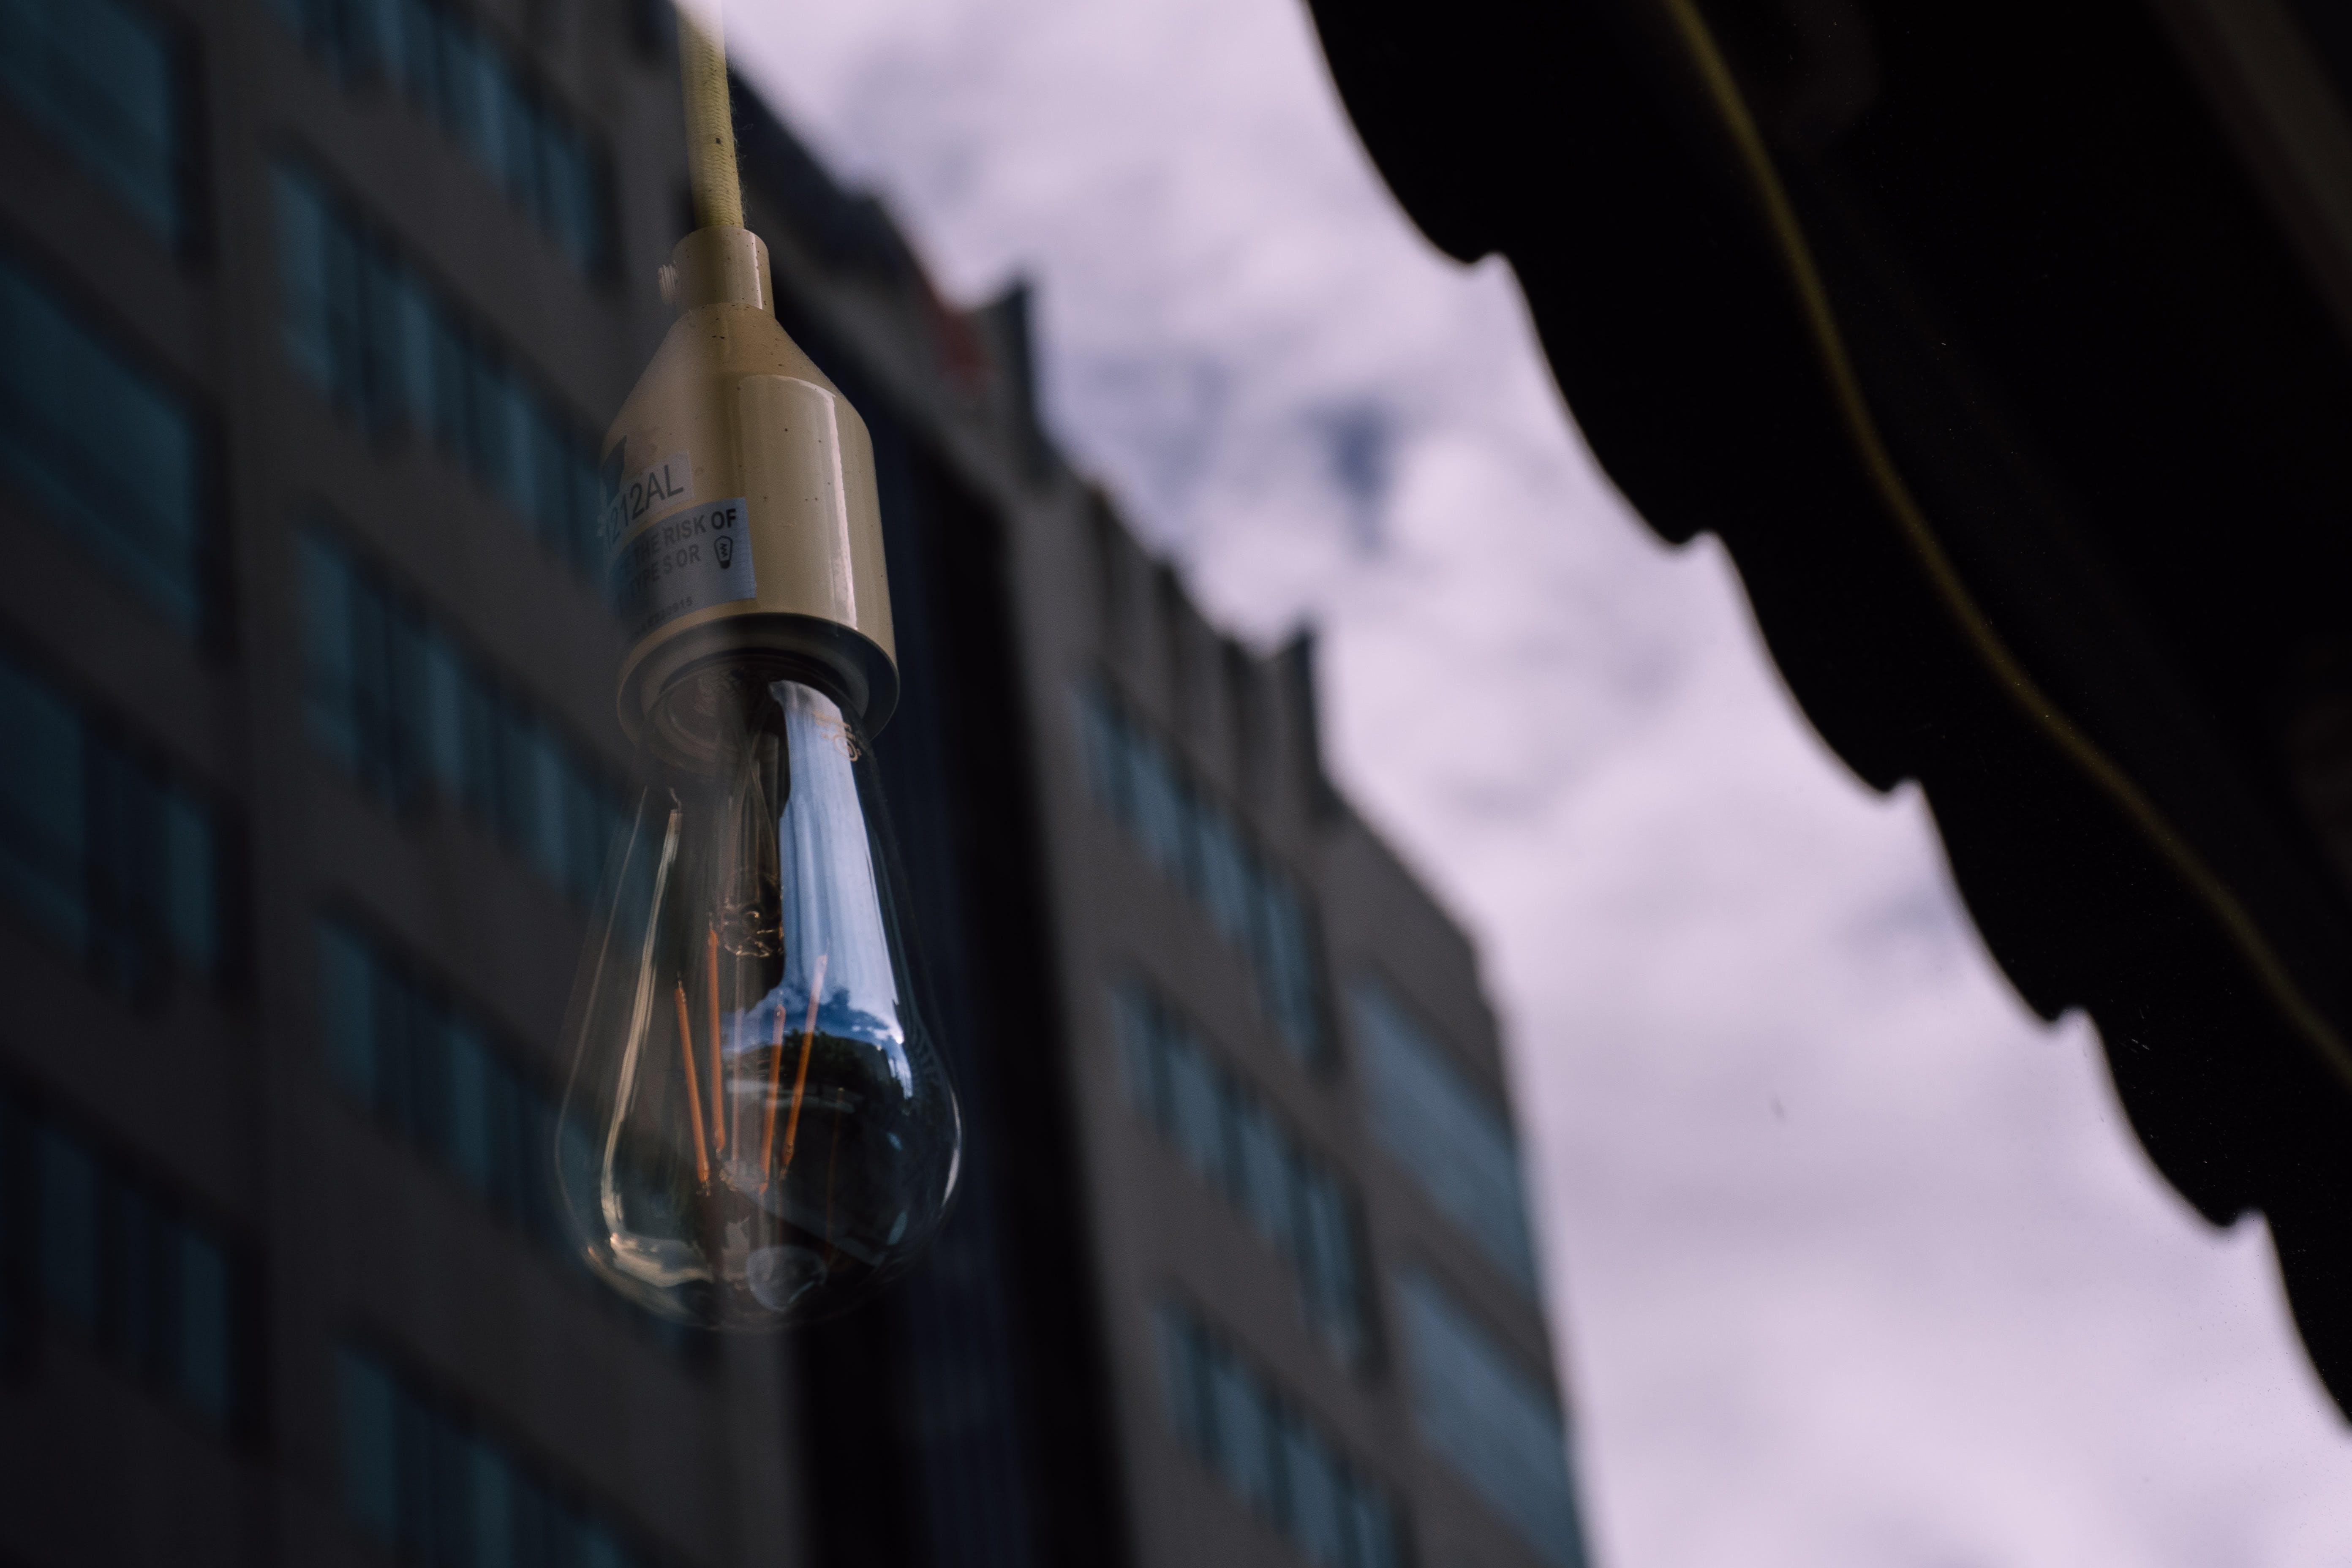 Fotos de stock gratuitas de arquitectura, colgando, cristal, edificio